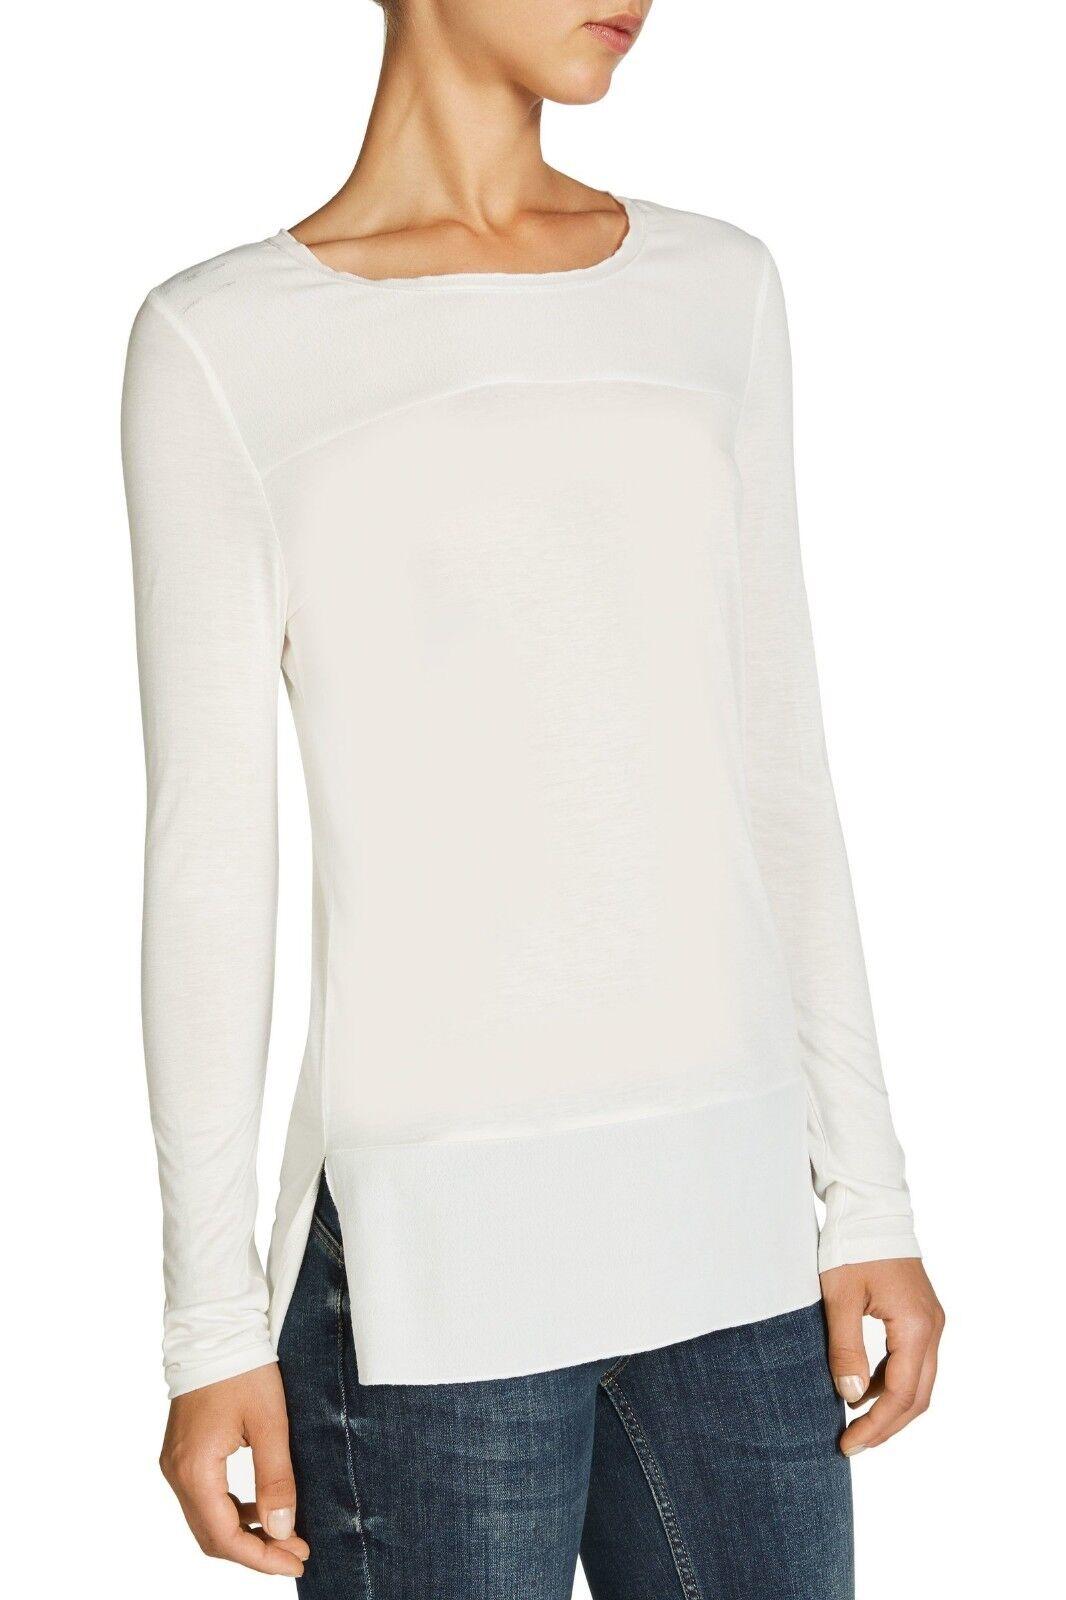 Patched-Shirt, Farbe  Wollweiß, Marke  Oui, Größe 36, 38, 40